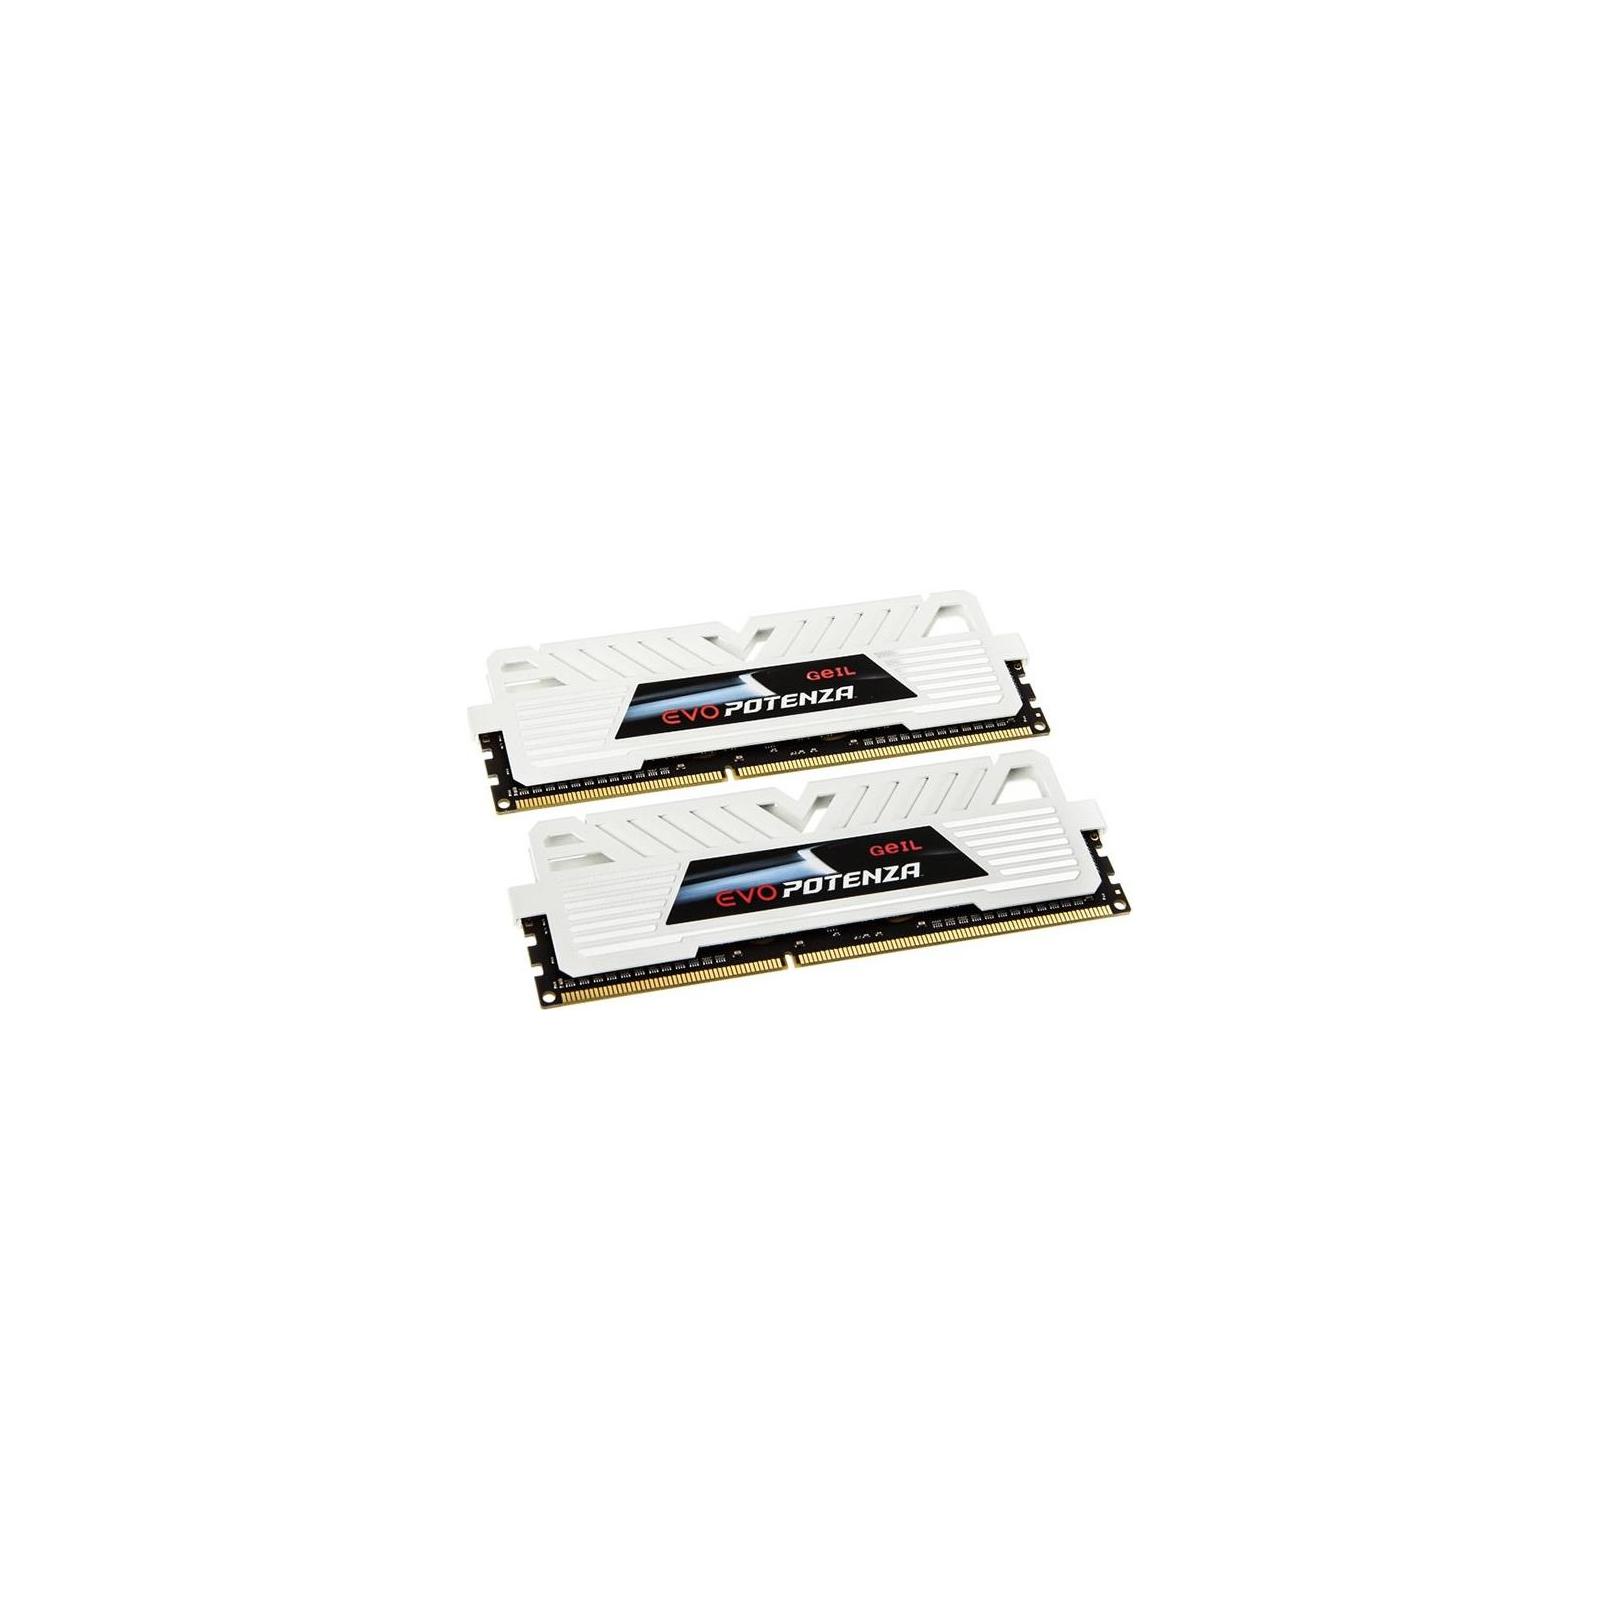 Модуль памяти для компьютера DDR3 16GB (2x8GB) 2400 MHz GEIL (GPW316GB2400C11BDC) изображение 2